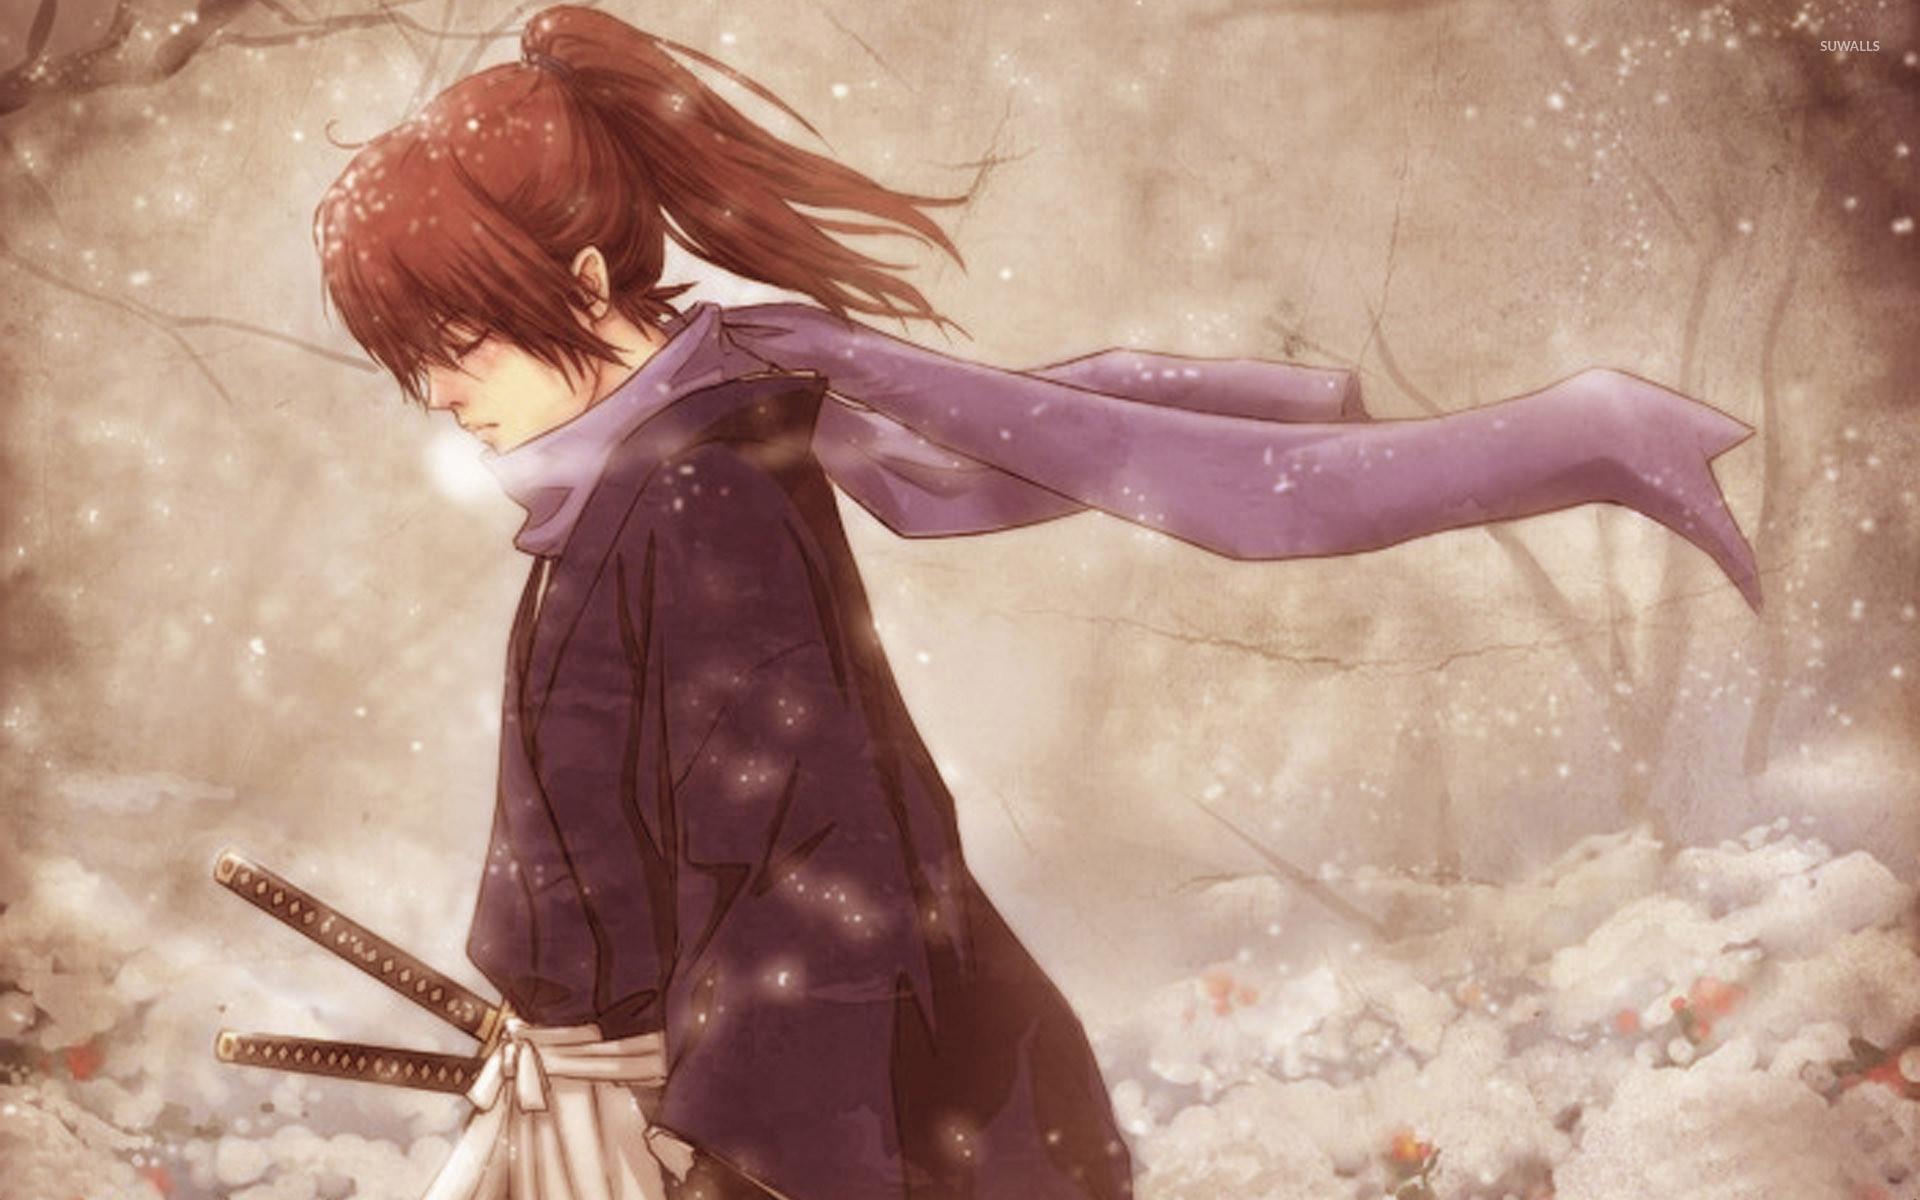 Rurouni Kenshin Coloring Pages